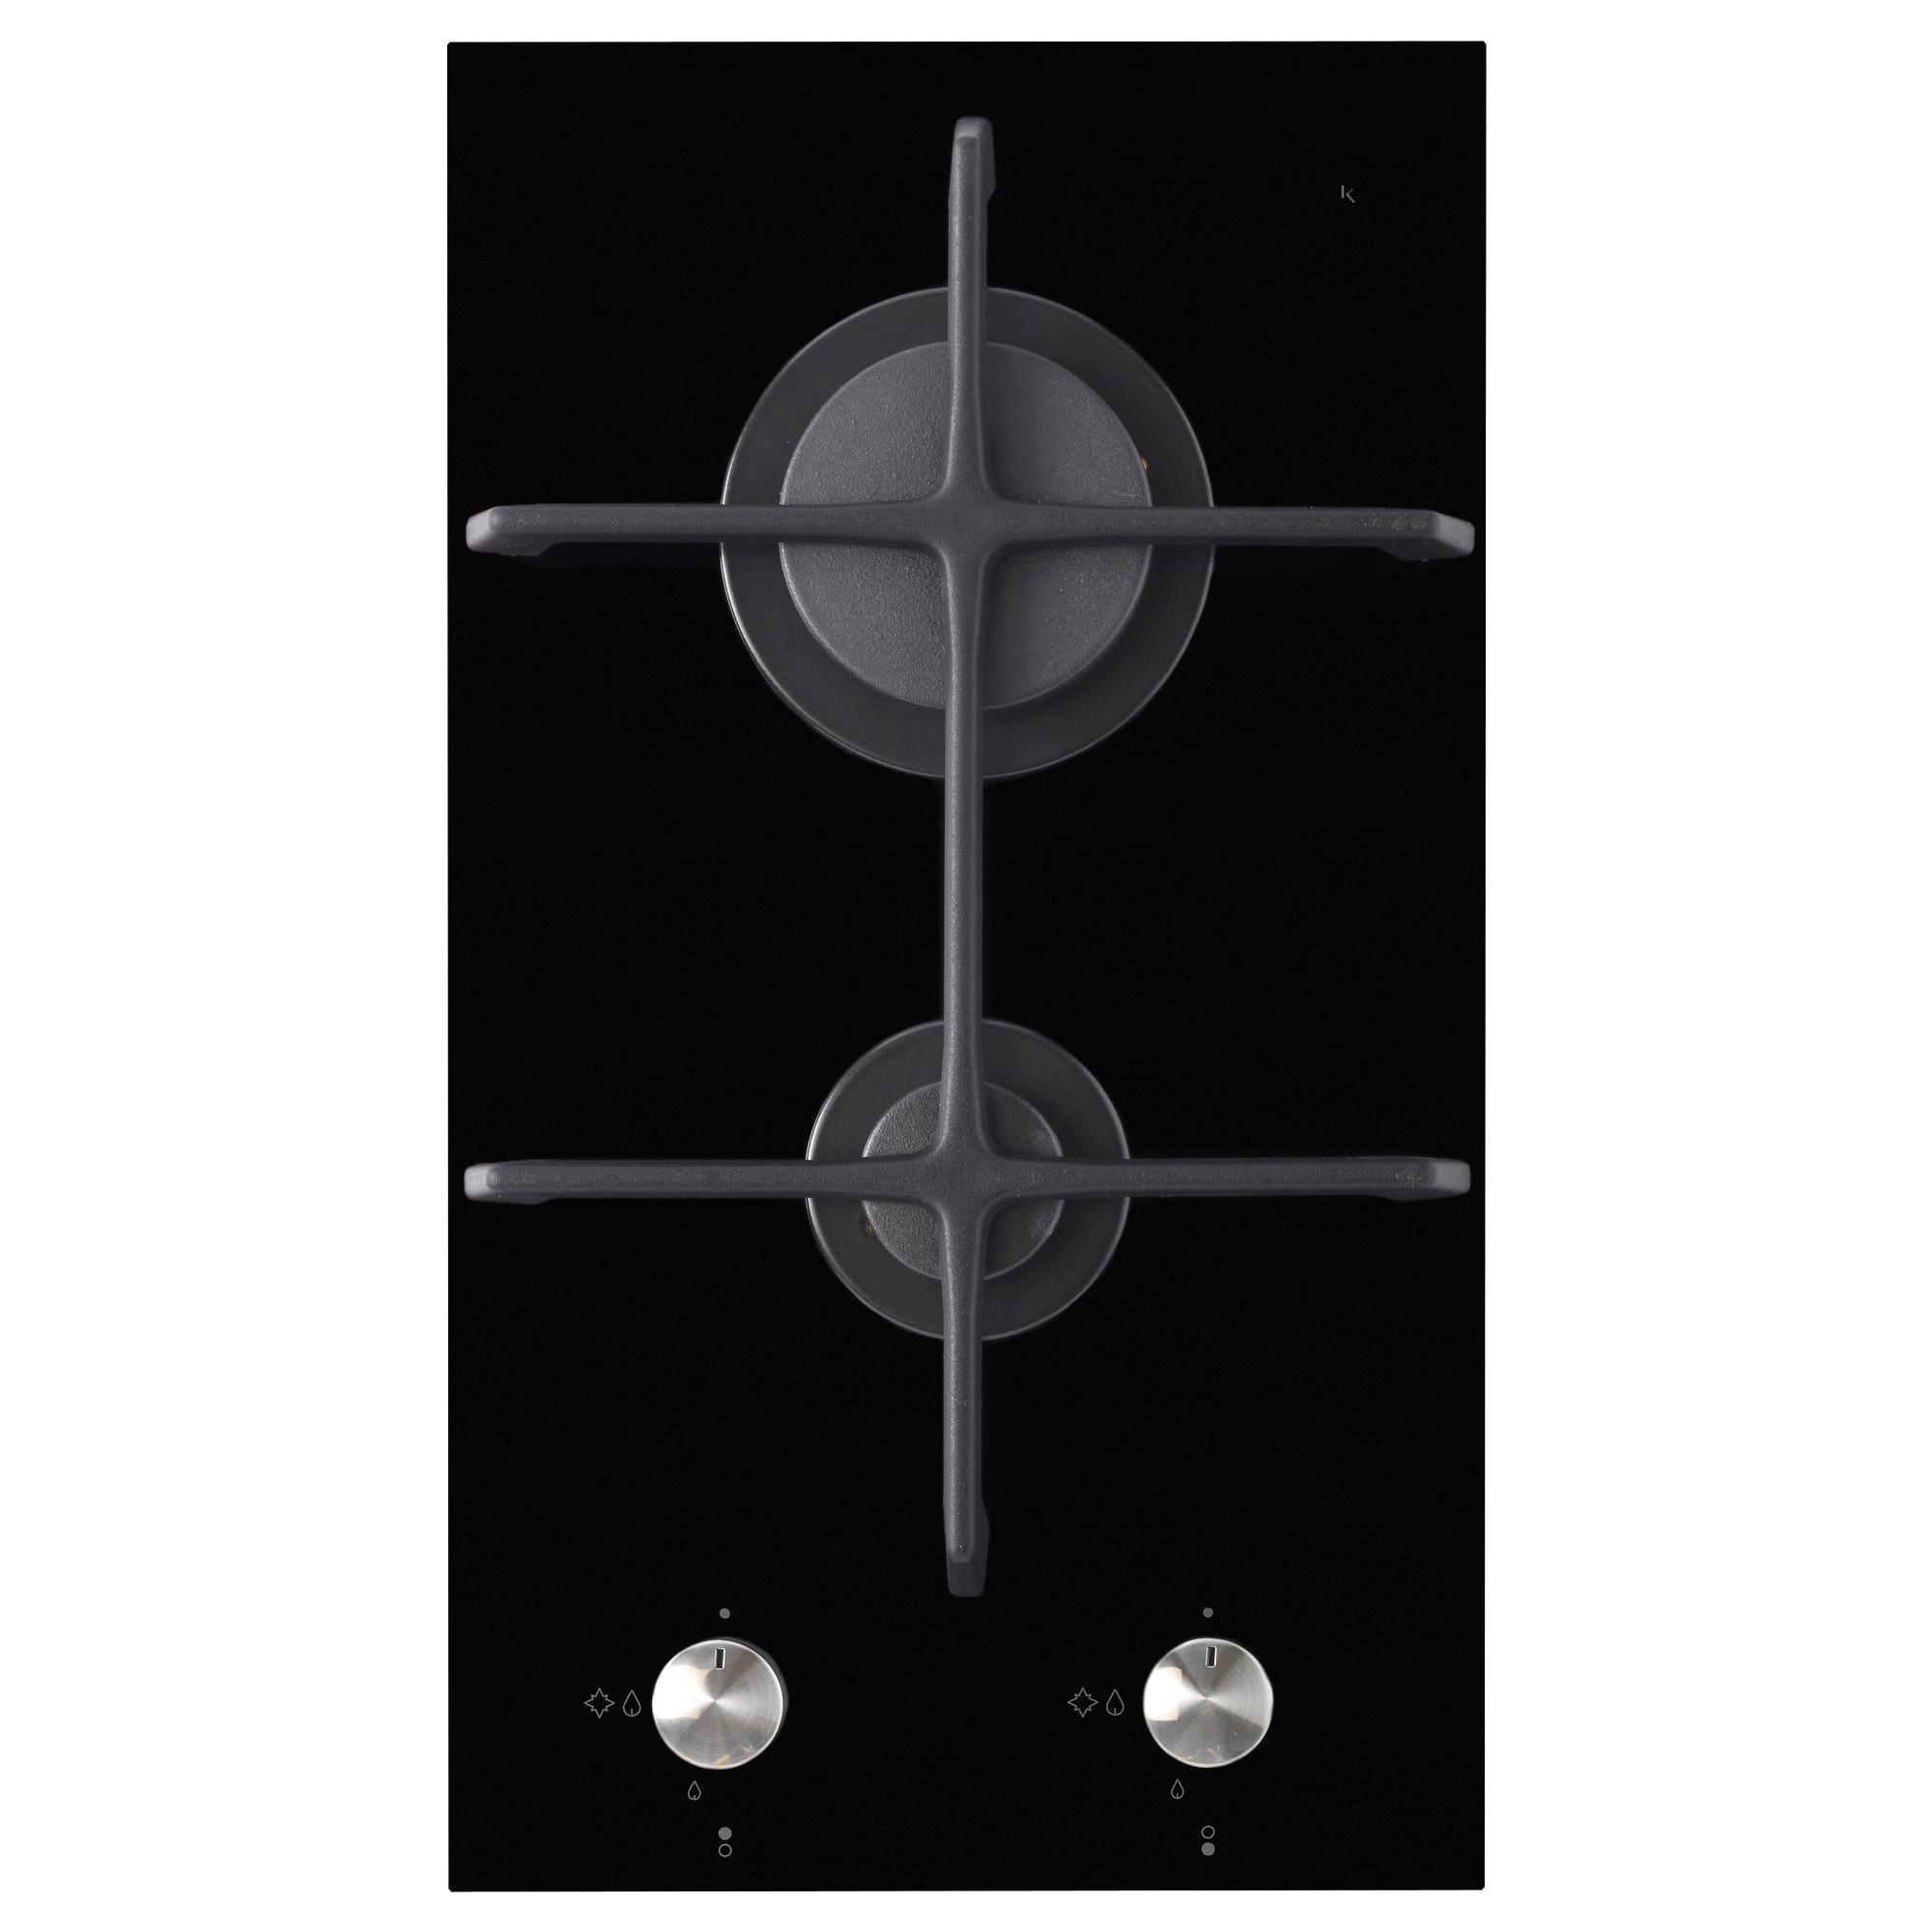 M 214 Jlig Domino Gas Hob 1 Burner Black 29 Cm Ikea